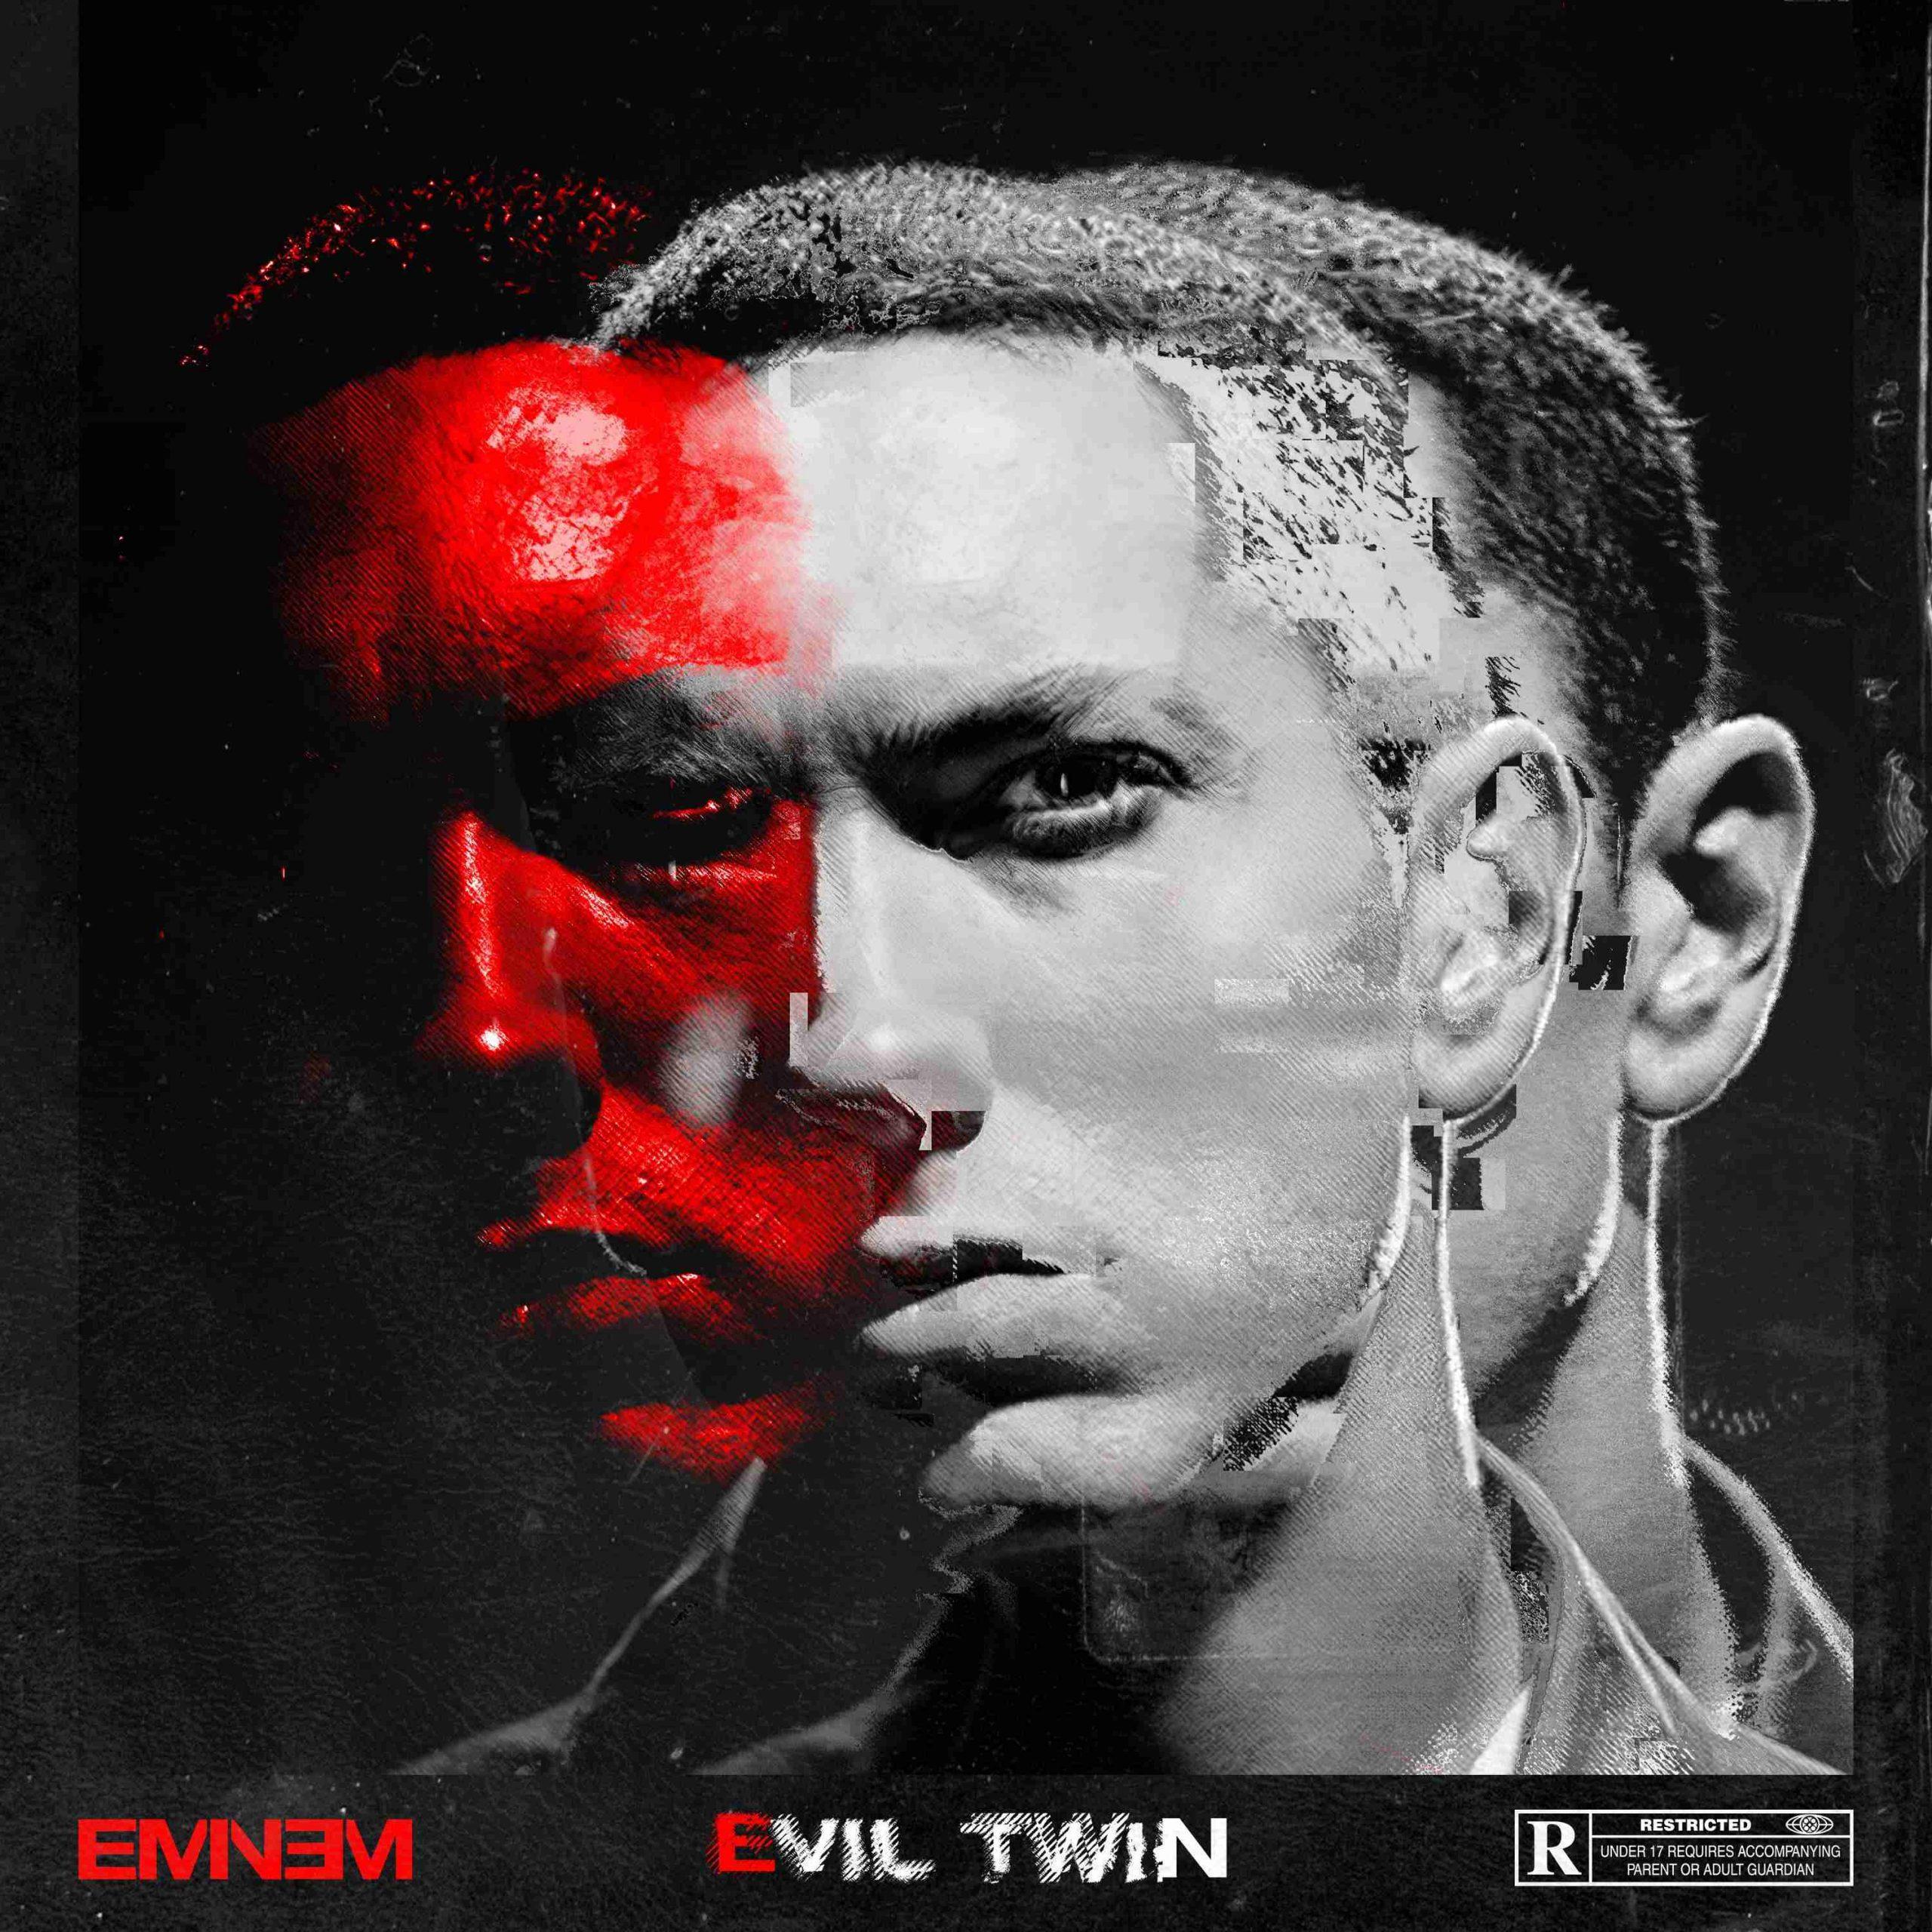 Eminem – Evil Twin